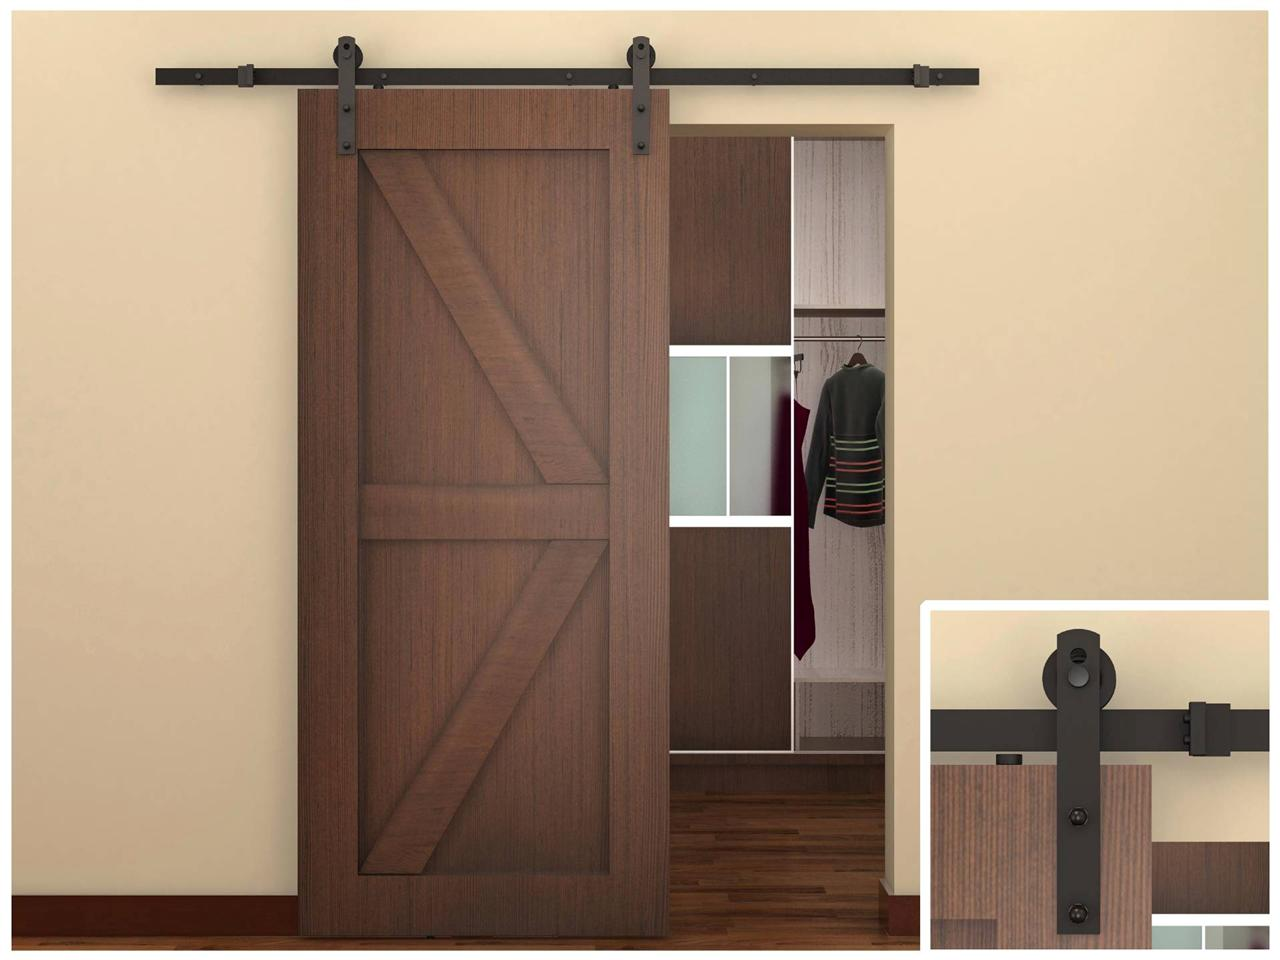 6 Ft Sliding Window : Ft dark coffee antique style steel sliding barn wood